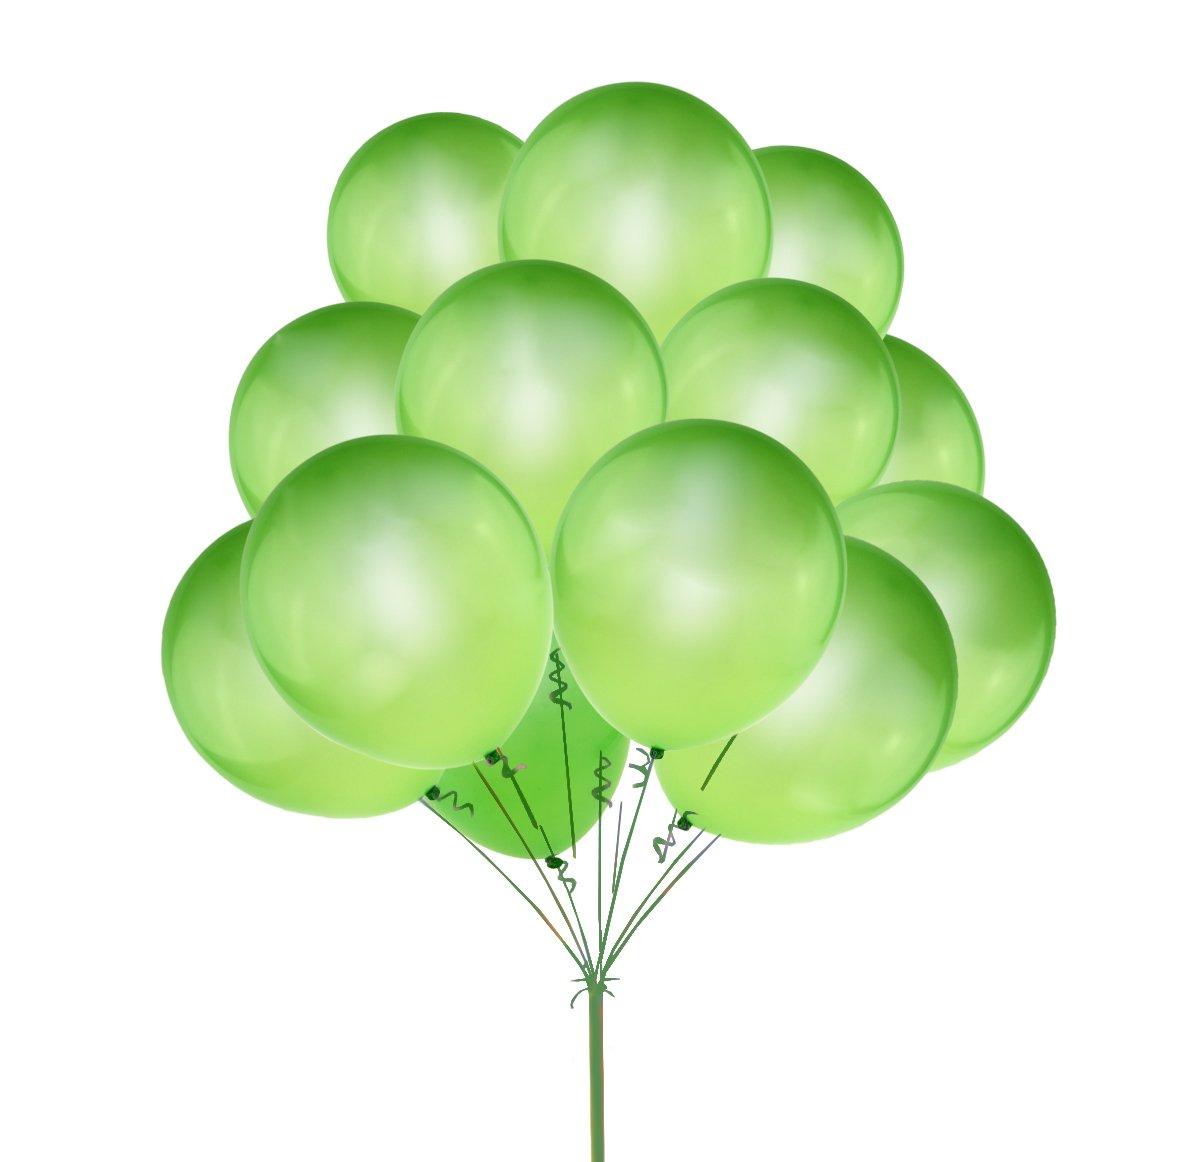 UTOPP 100 pcs Light Green Balloons 12 inches Thick Latex Helium Balloons 9.88 oz/Bag St Patricks Day Carnival Festival Birthday Party